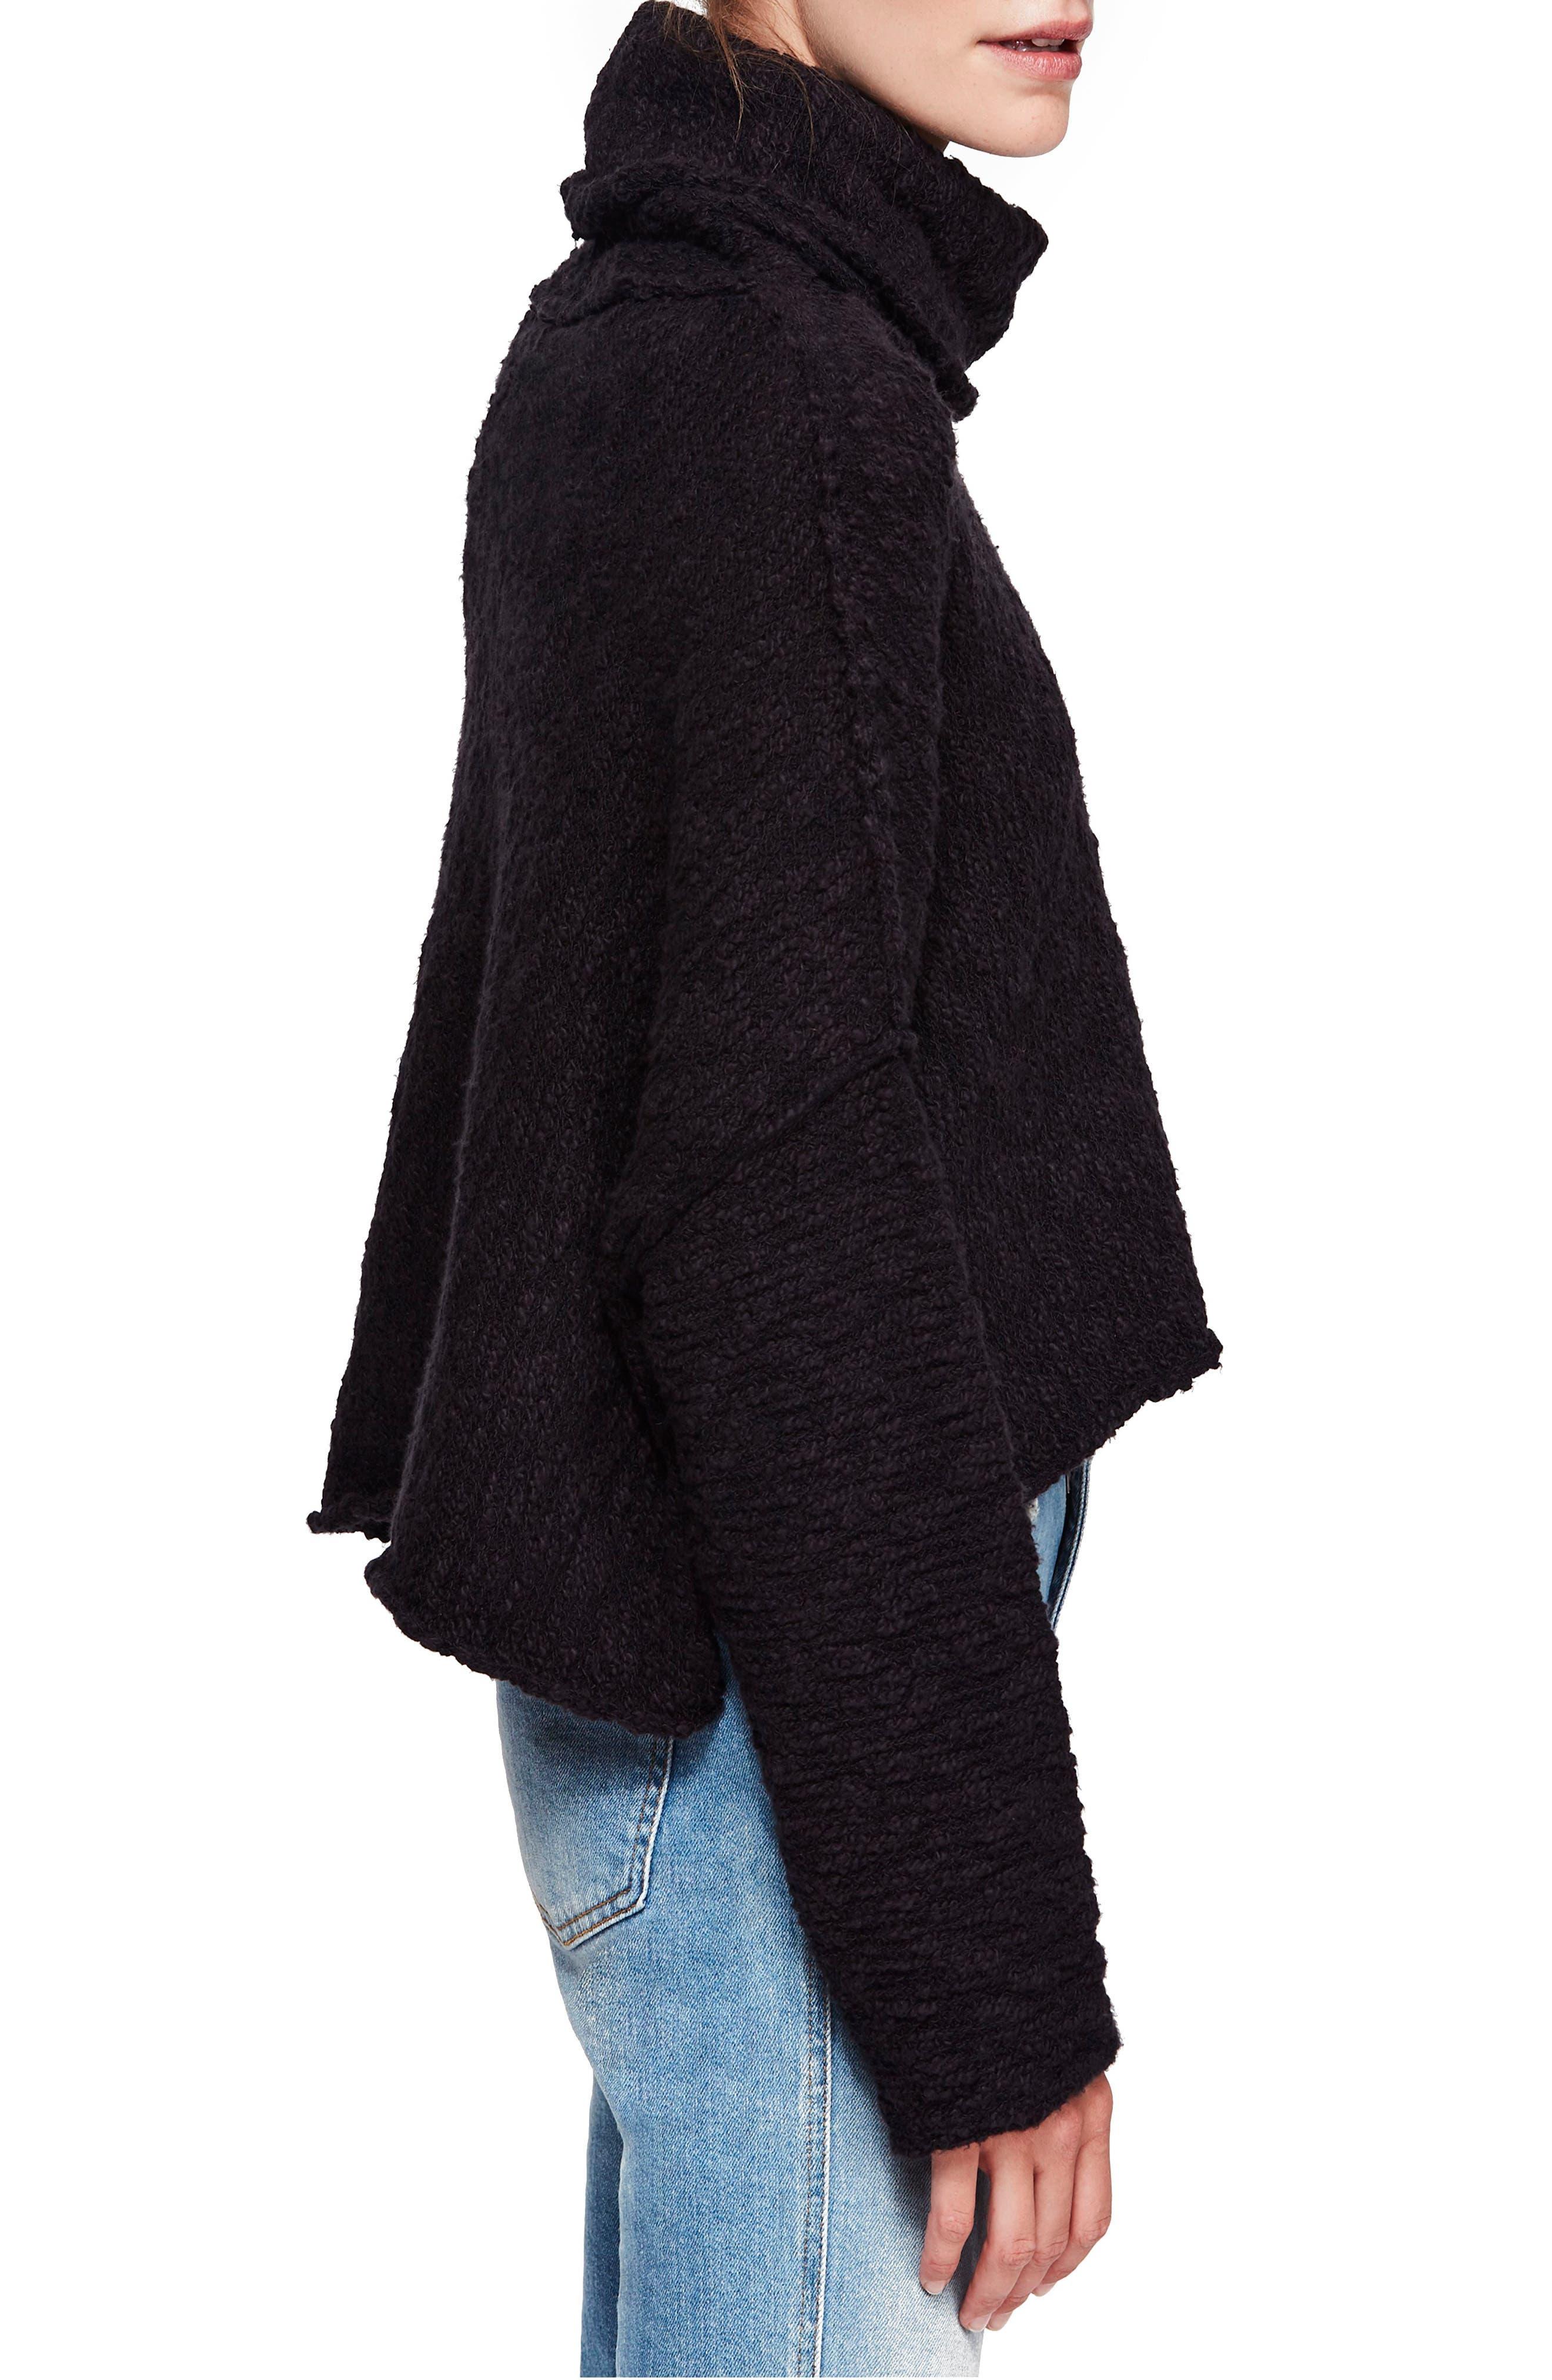 Big Easy Cowl Neck Crop Sweater,                             Alternate thumbnail 3, color,                             BLACK